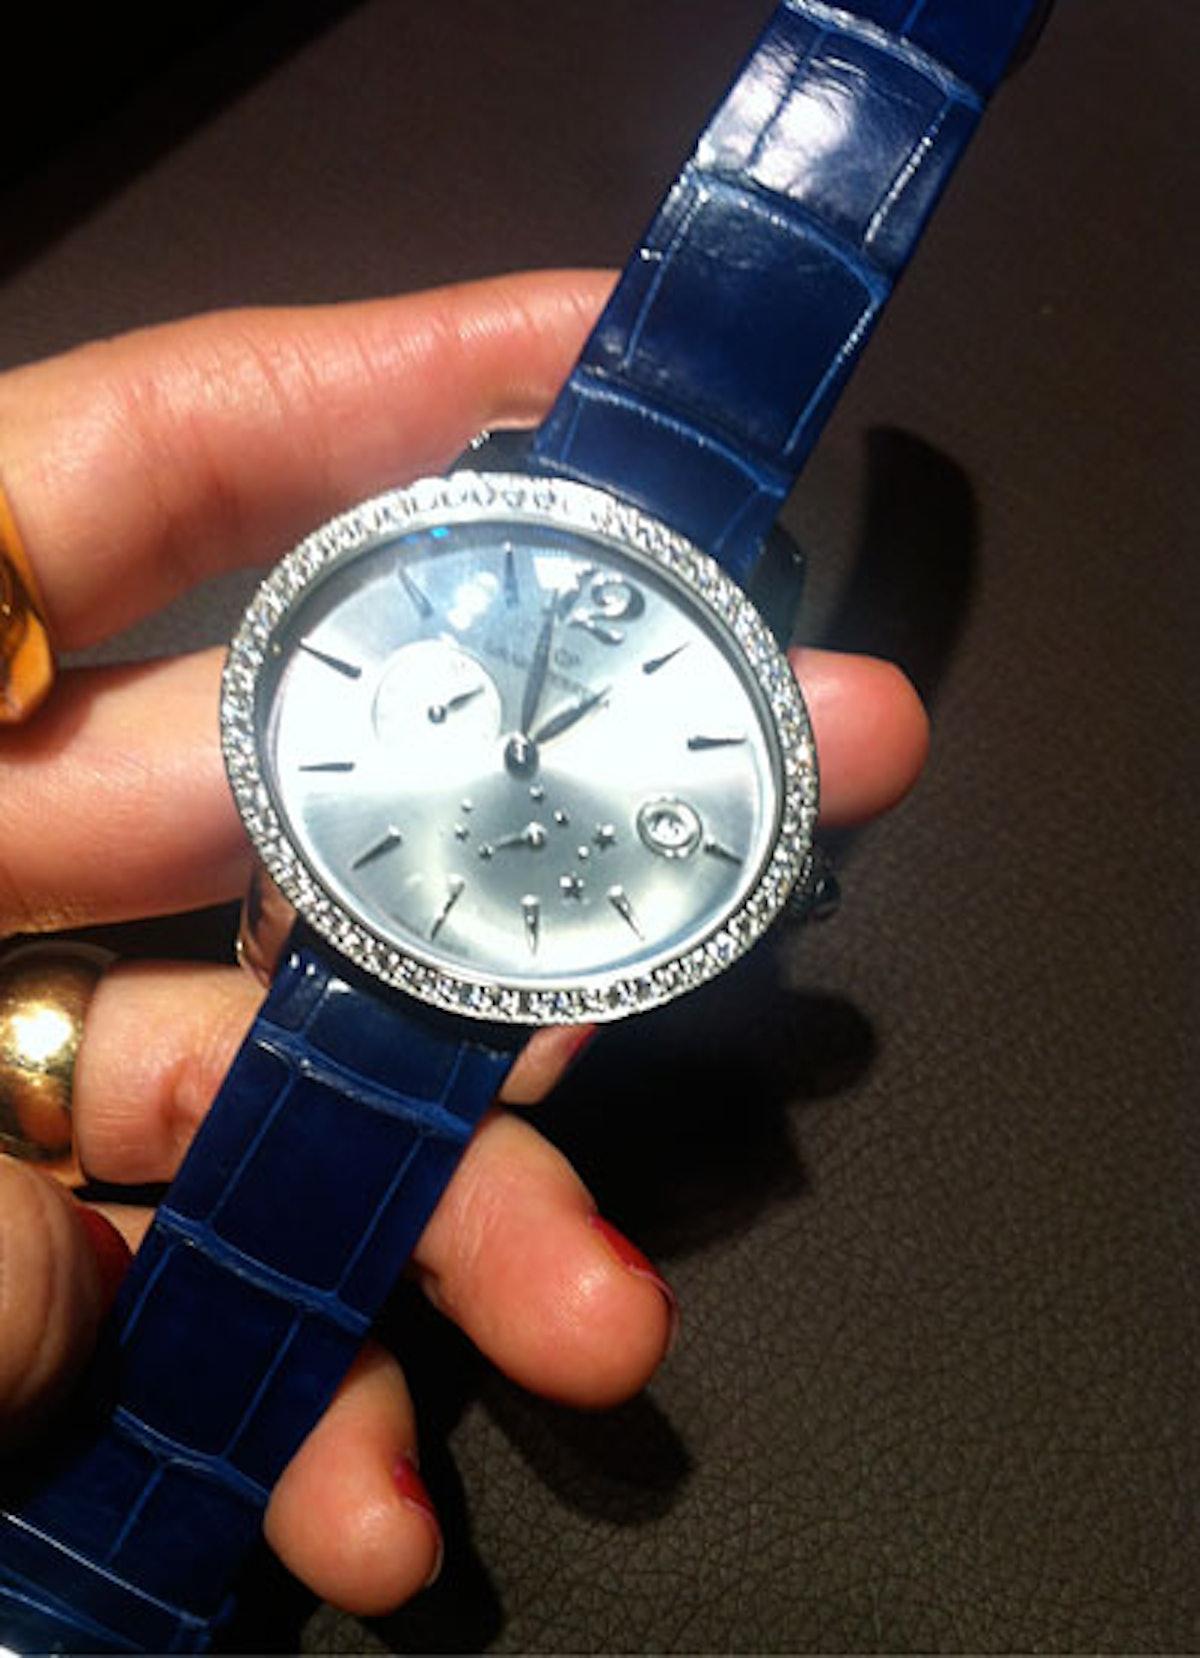 acss-claudia-mata-blue-watches-09-v.jpg